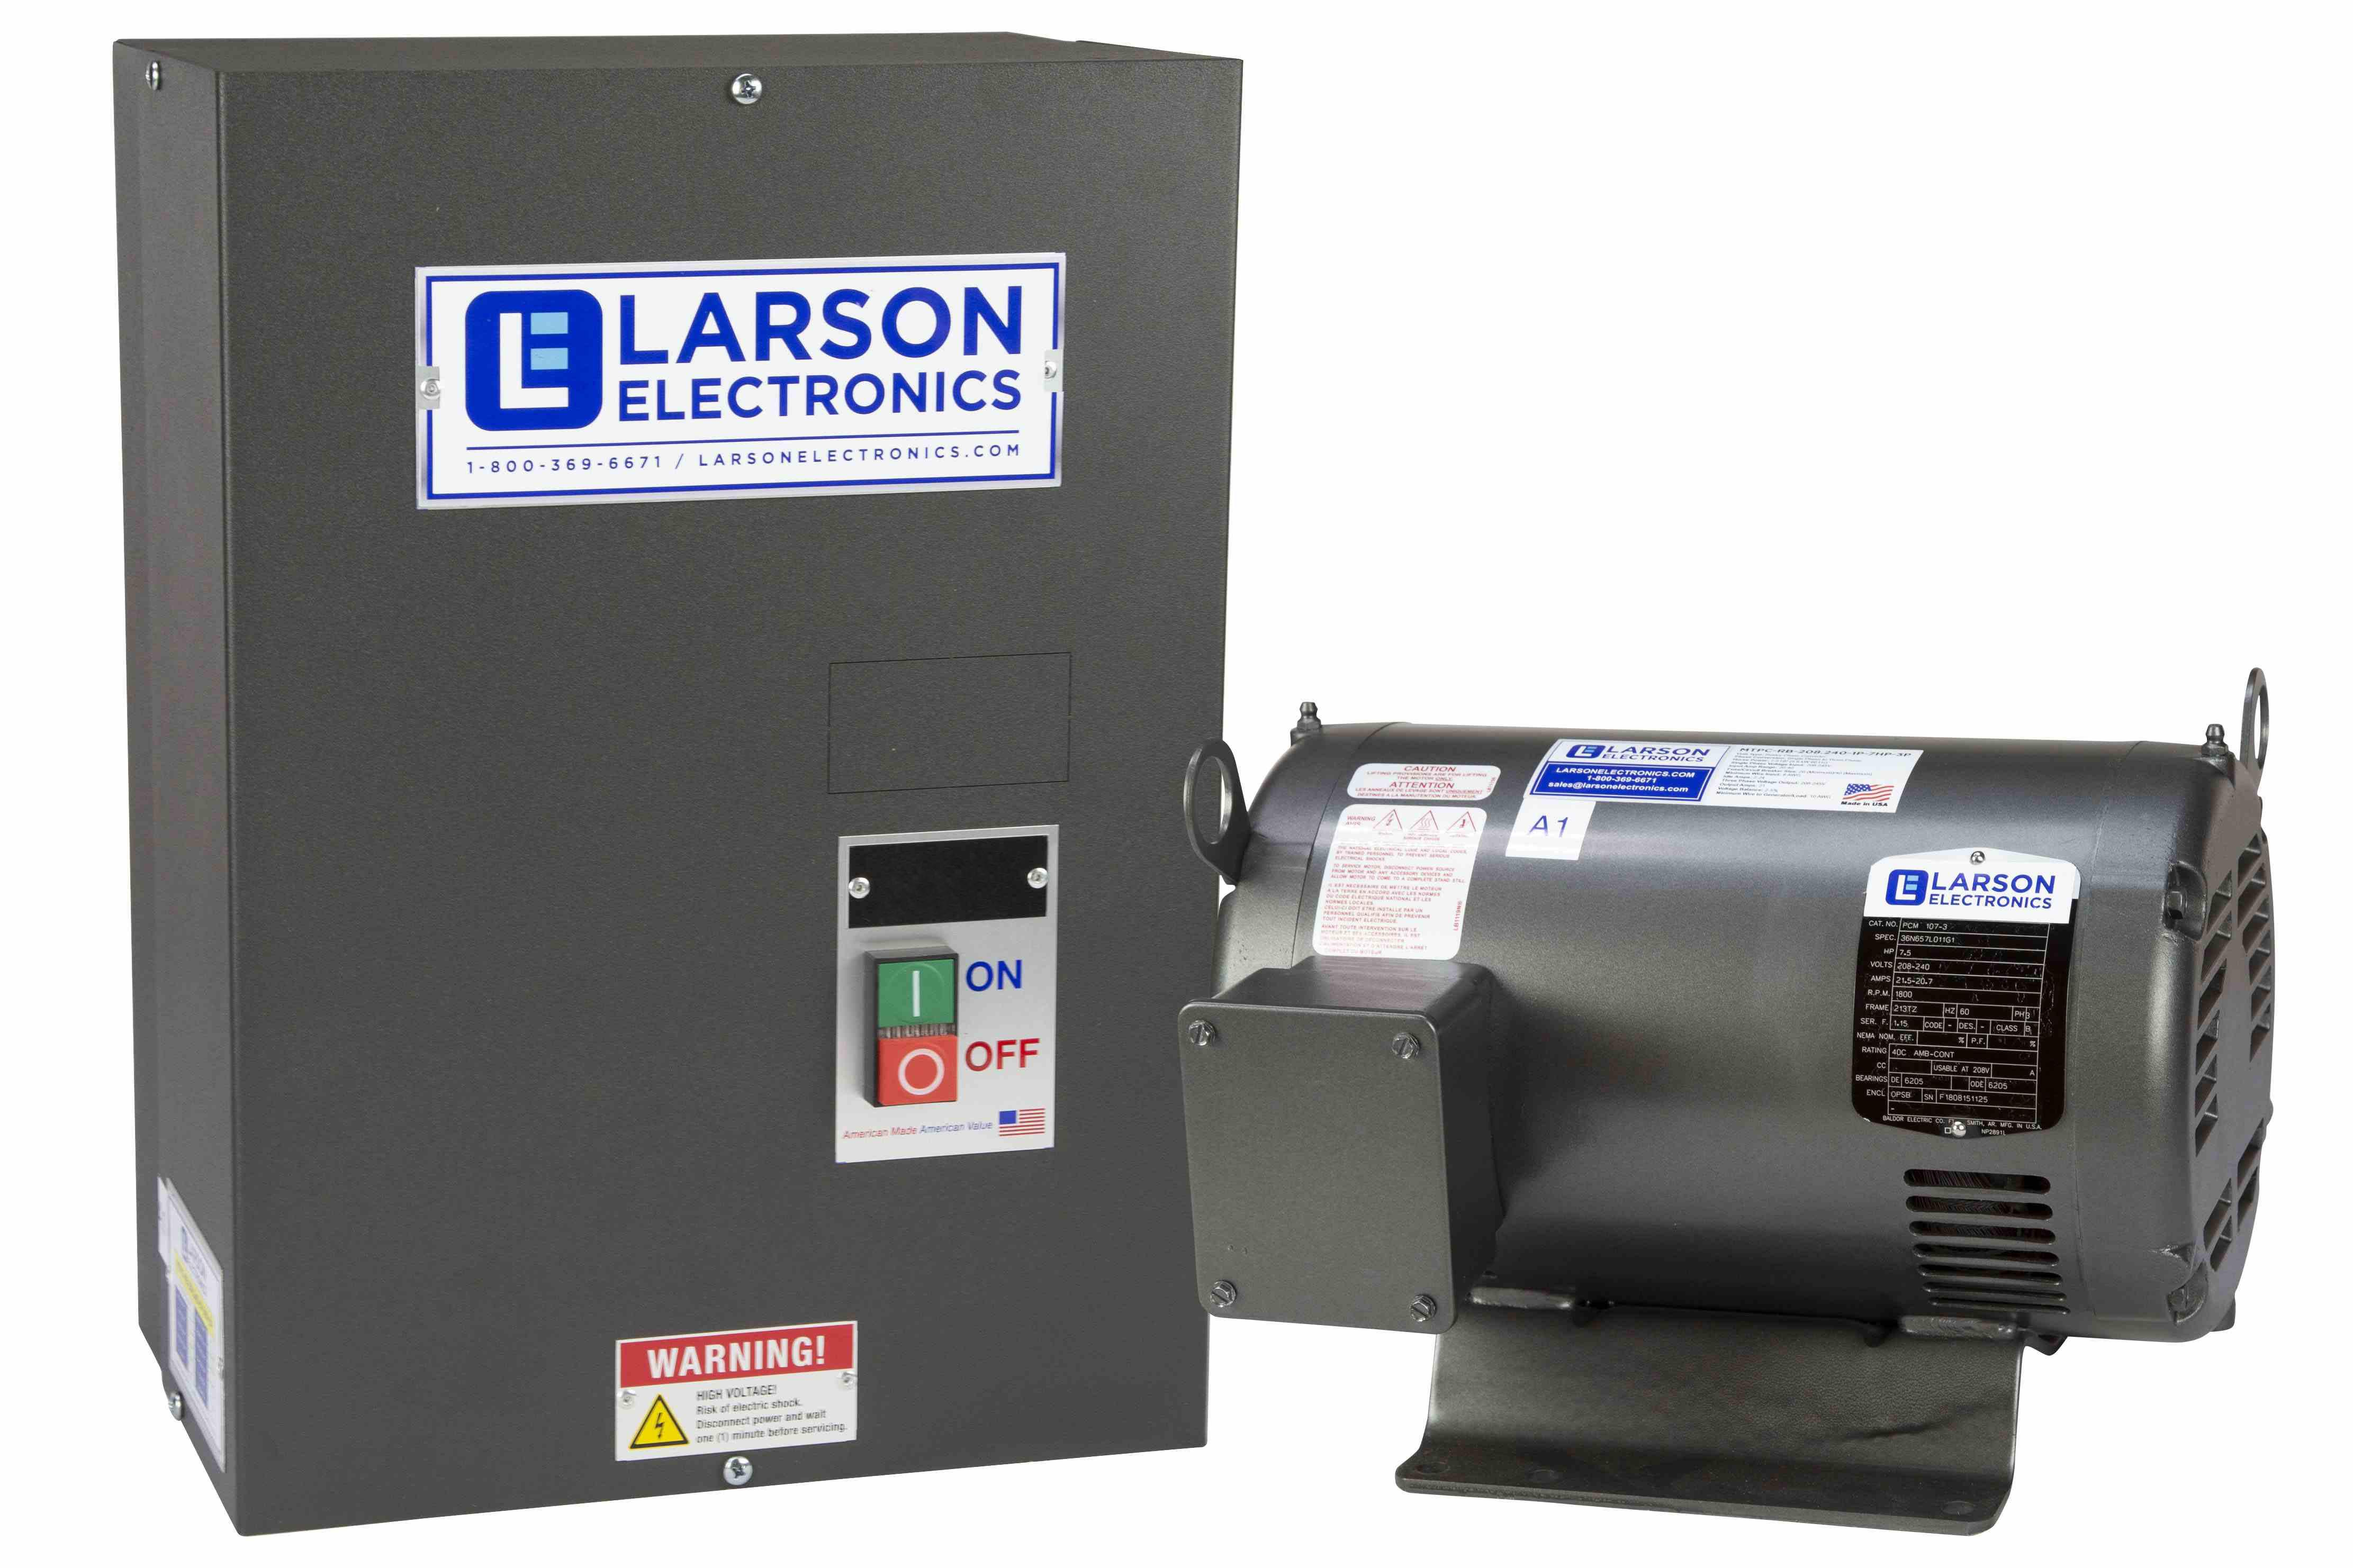 Rotary Phase Converter for 50HP Medium Loads, 440V 1PH to 3PH, 35.5 Amps Output, 75HP Idler, NEMA 1